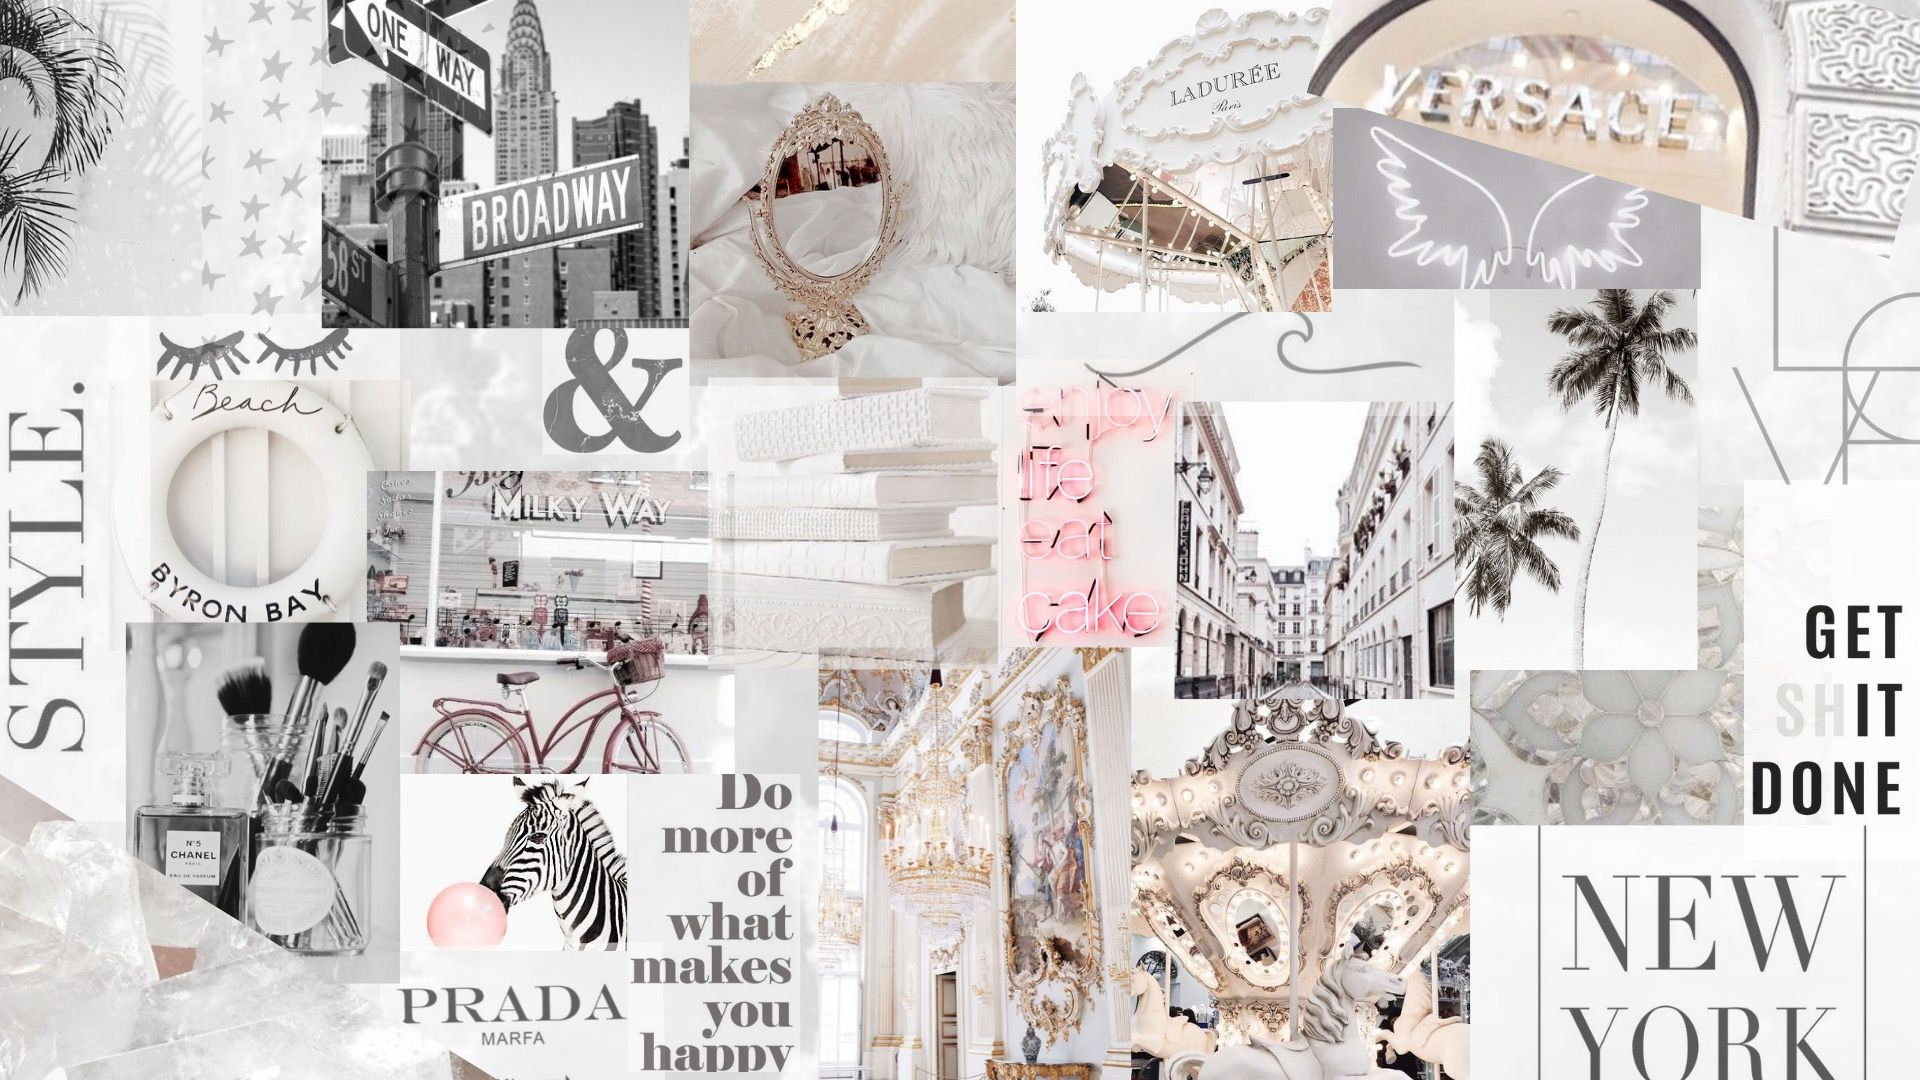 Pin By Laura Valencia On Desktop Wallpaper Collages In 2020 Aesthetic Desktop Wallpaper Macbook Wallpaper Desktop Wallpaper Art